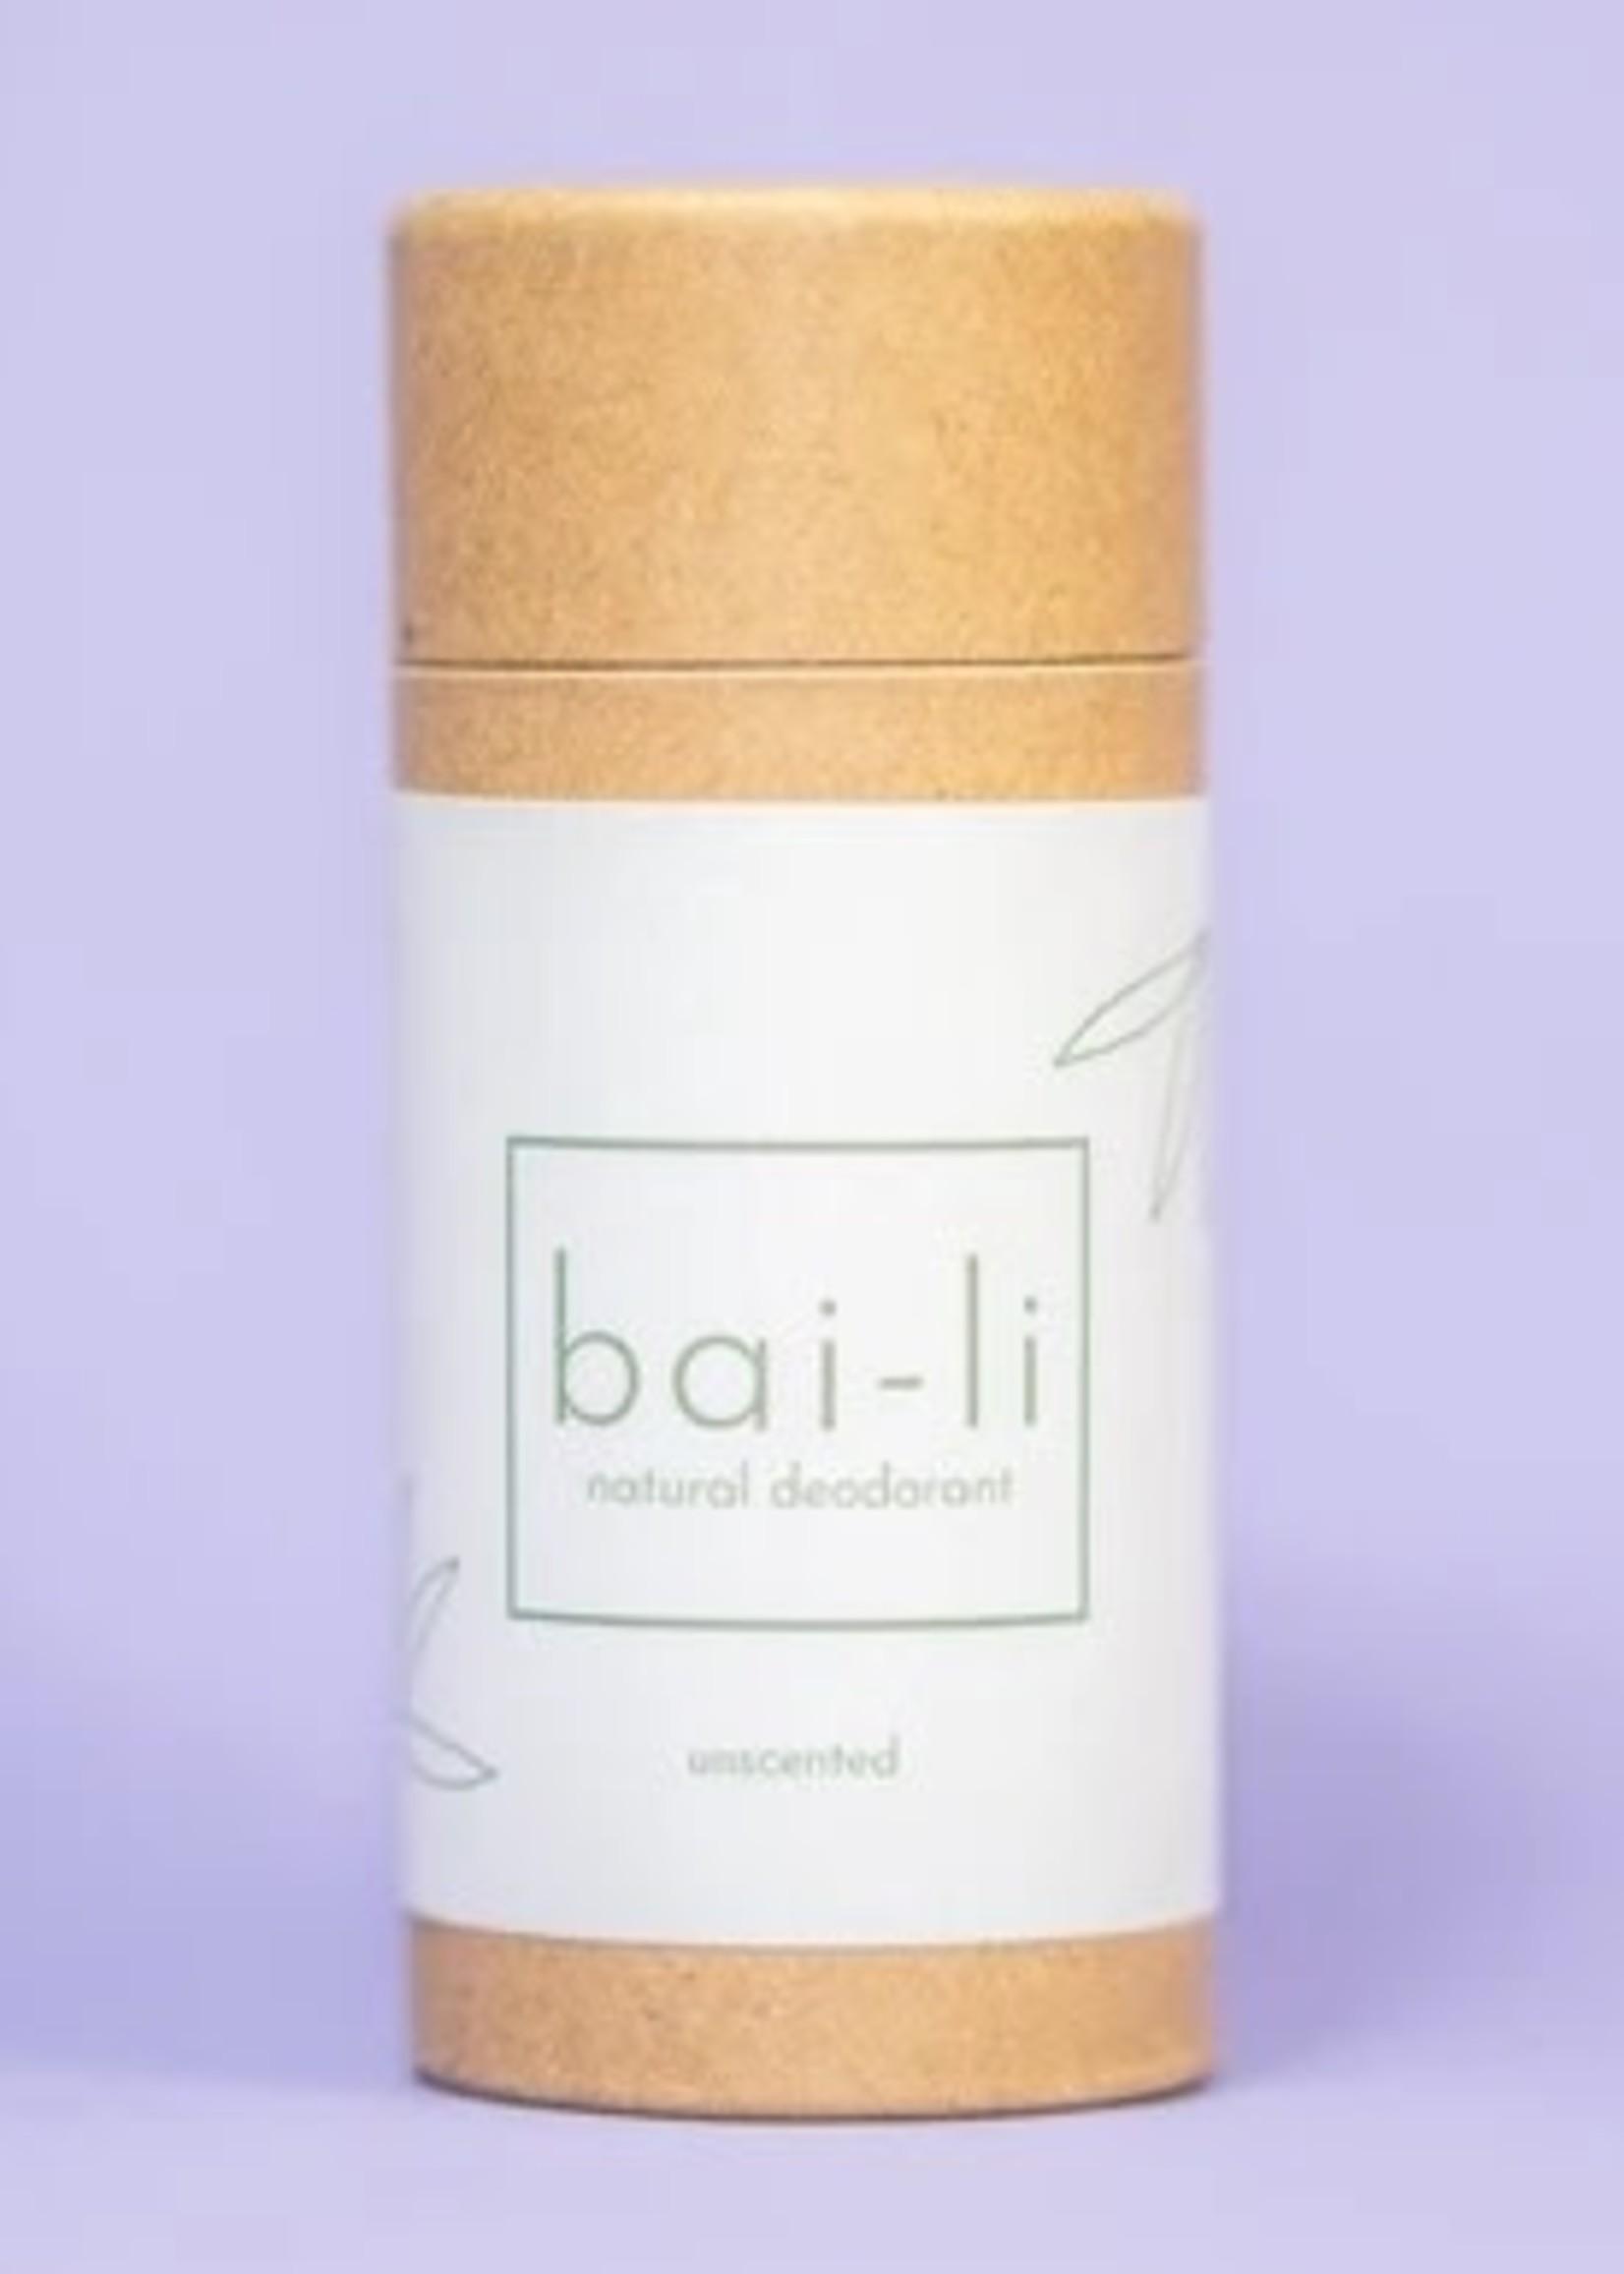 Bai-li Unscented Deodorant